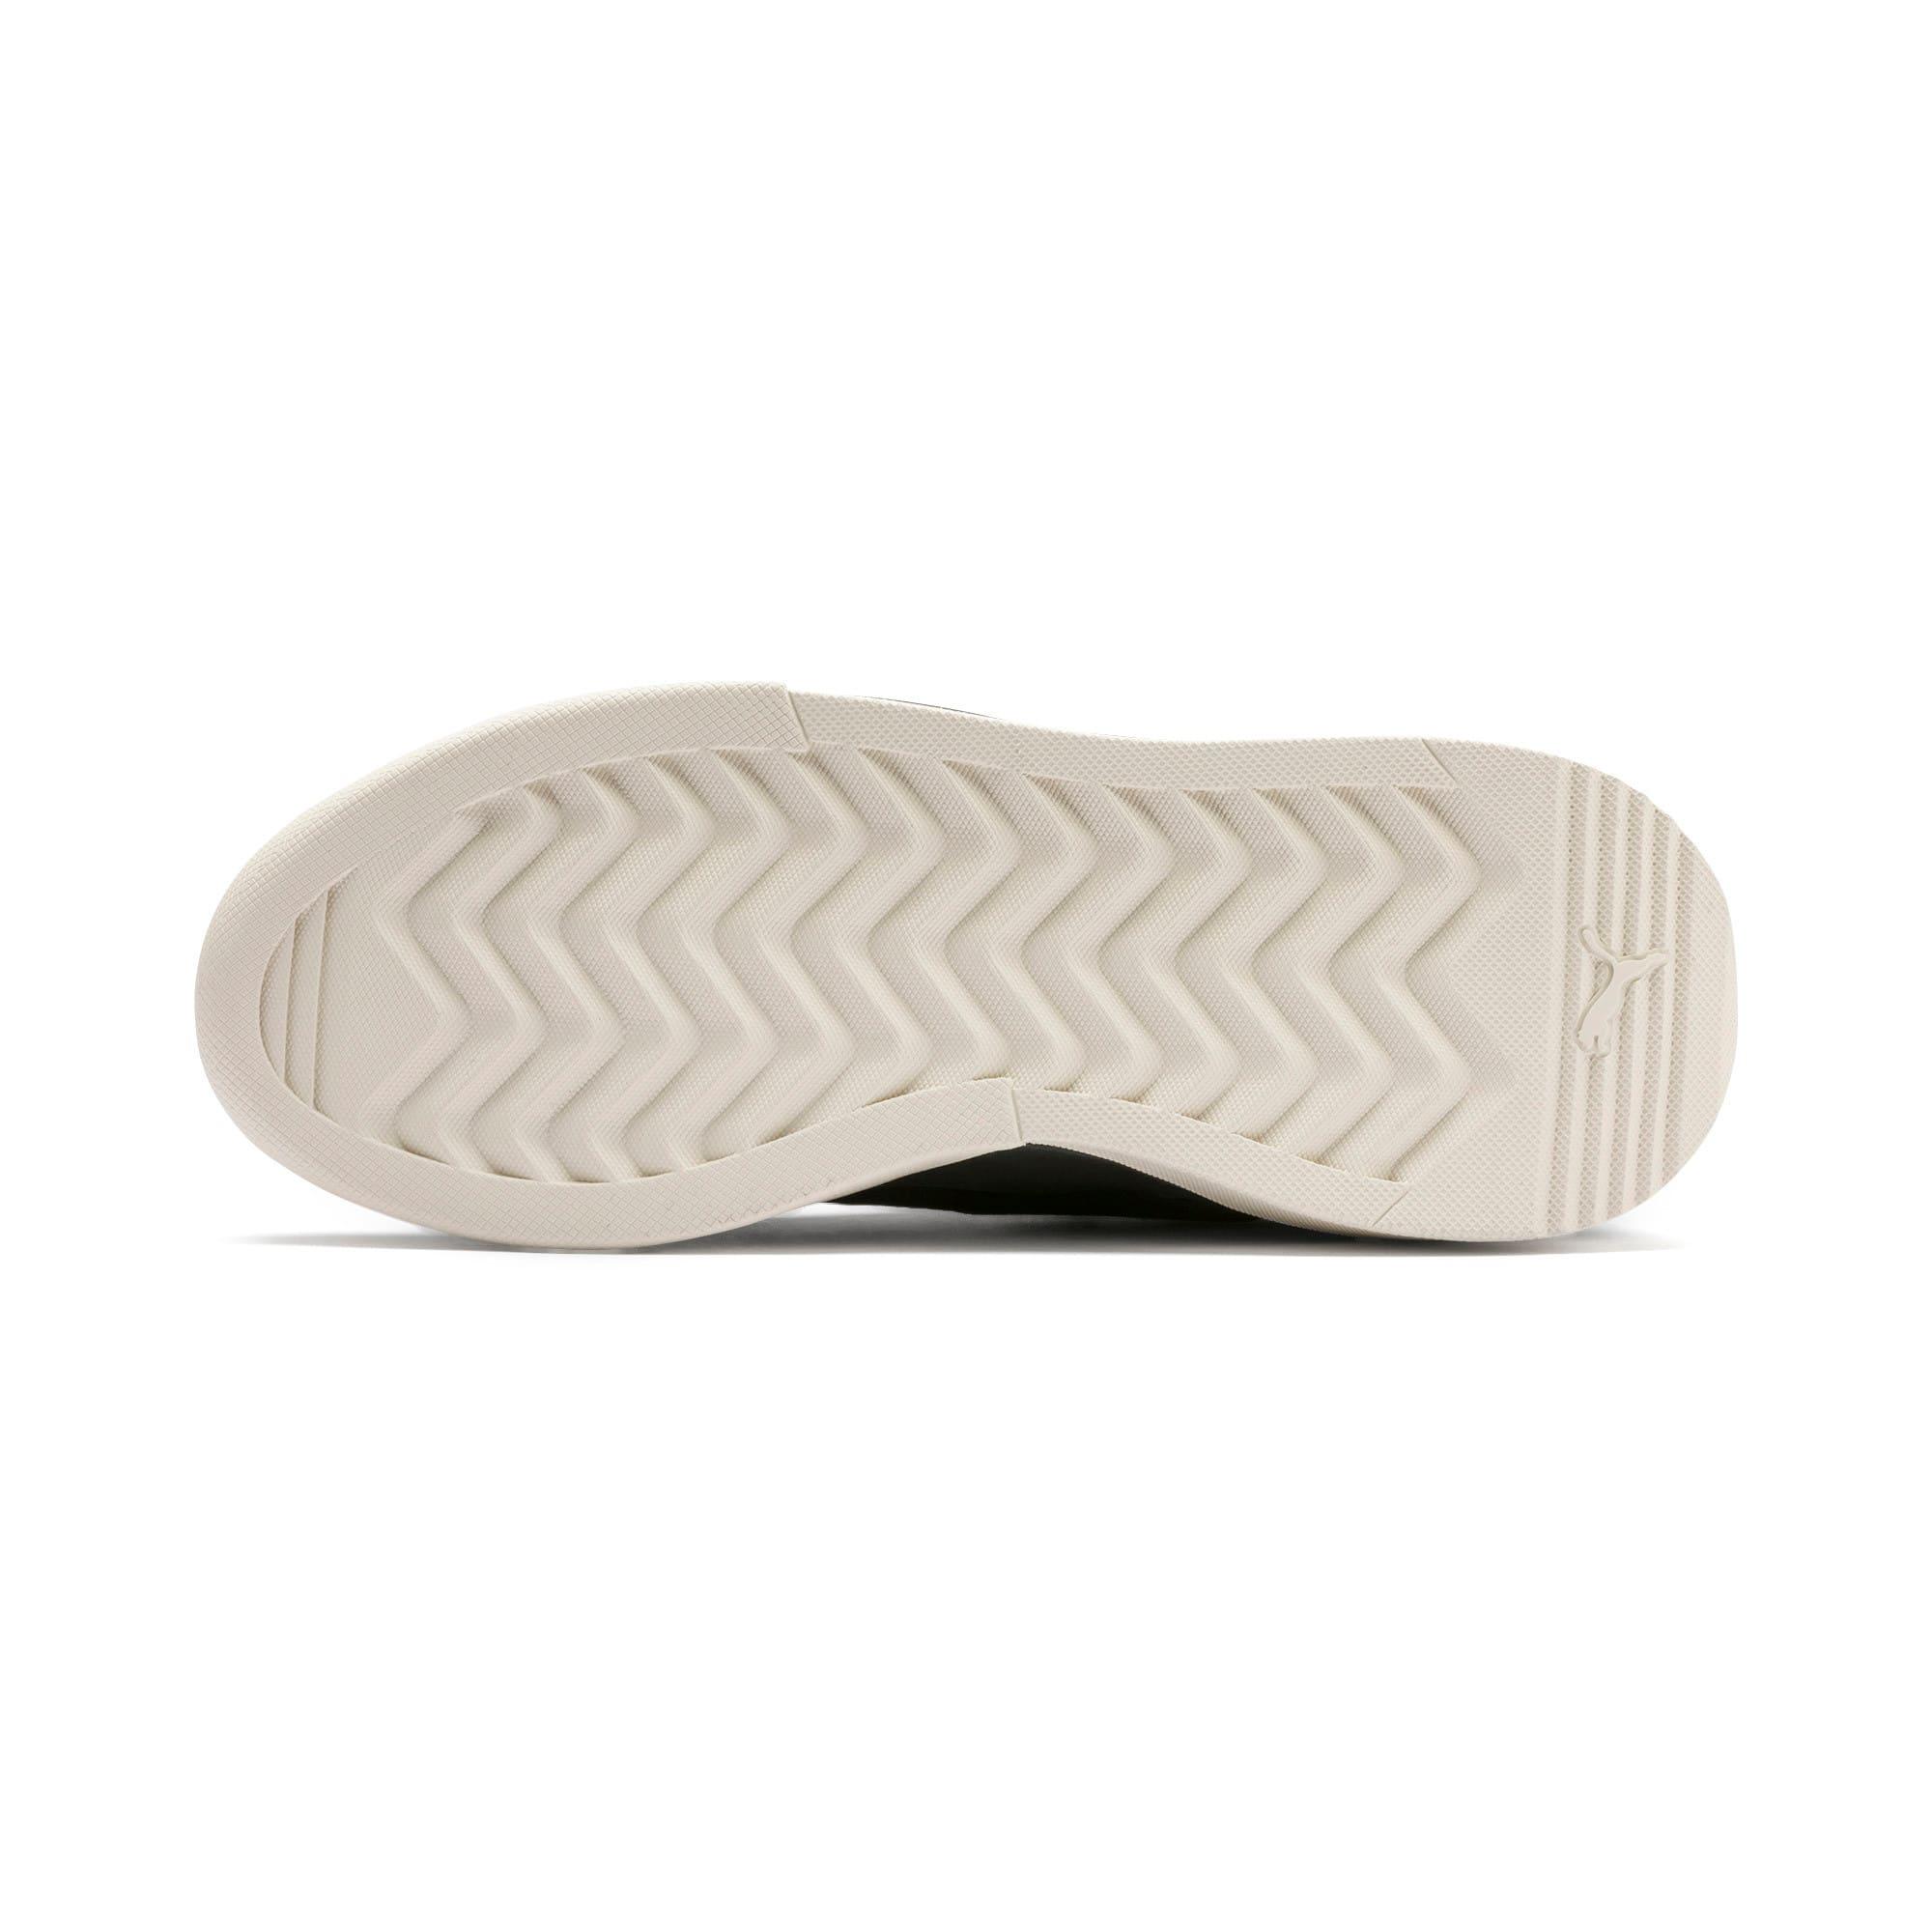 Thumbnail 5 of Aeon Play Women's Sneakers, Puma Black, medium